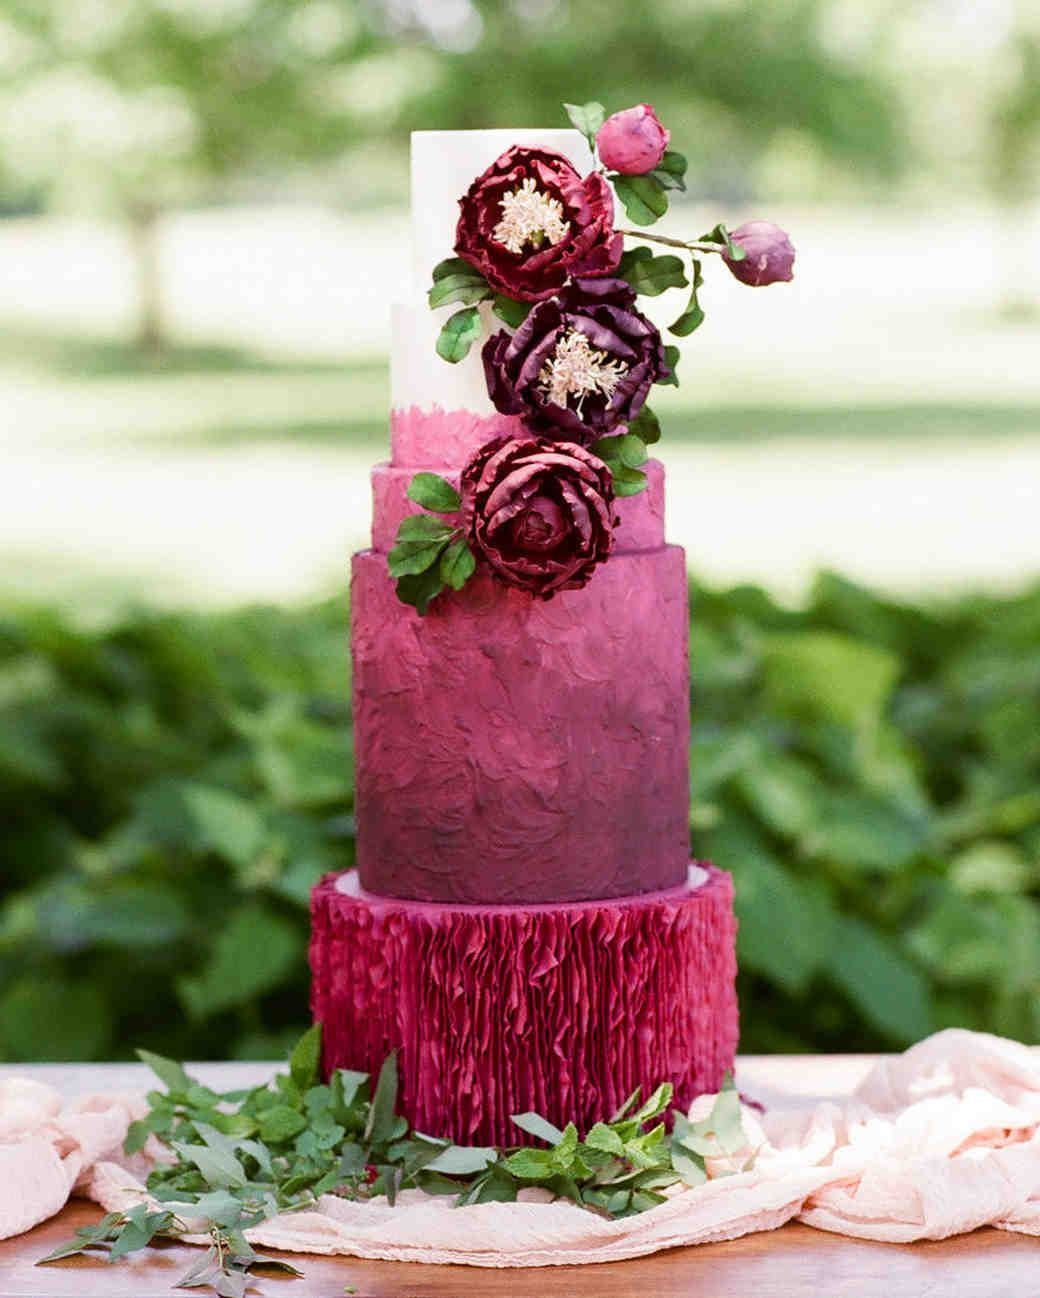 Wedding cake design ideas thatull wow your guests martha stewart